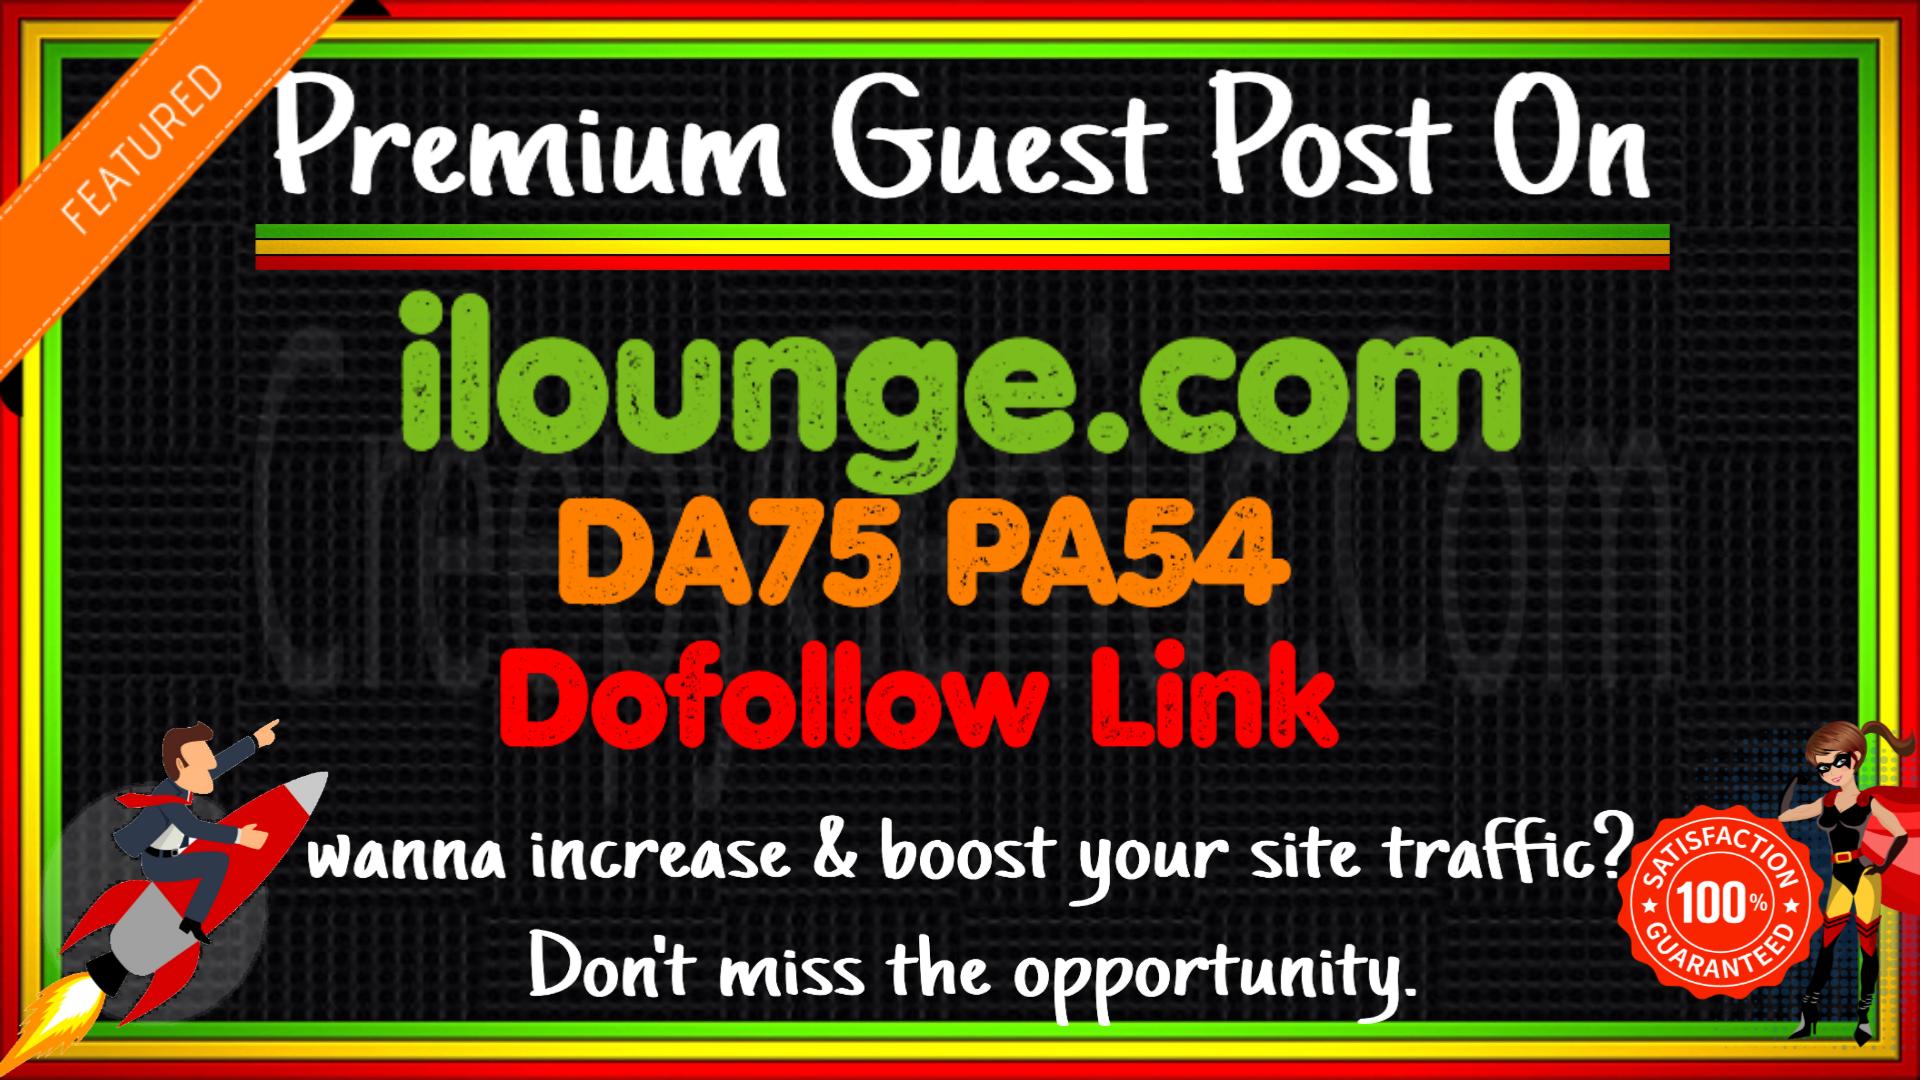 Write & Publish A Guest Post On ilounge. com DA75 PA54 with DF